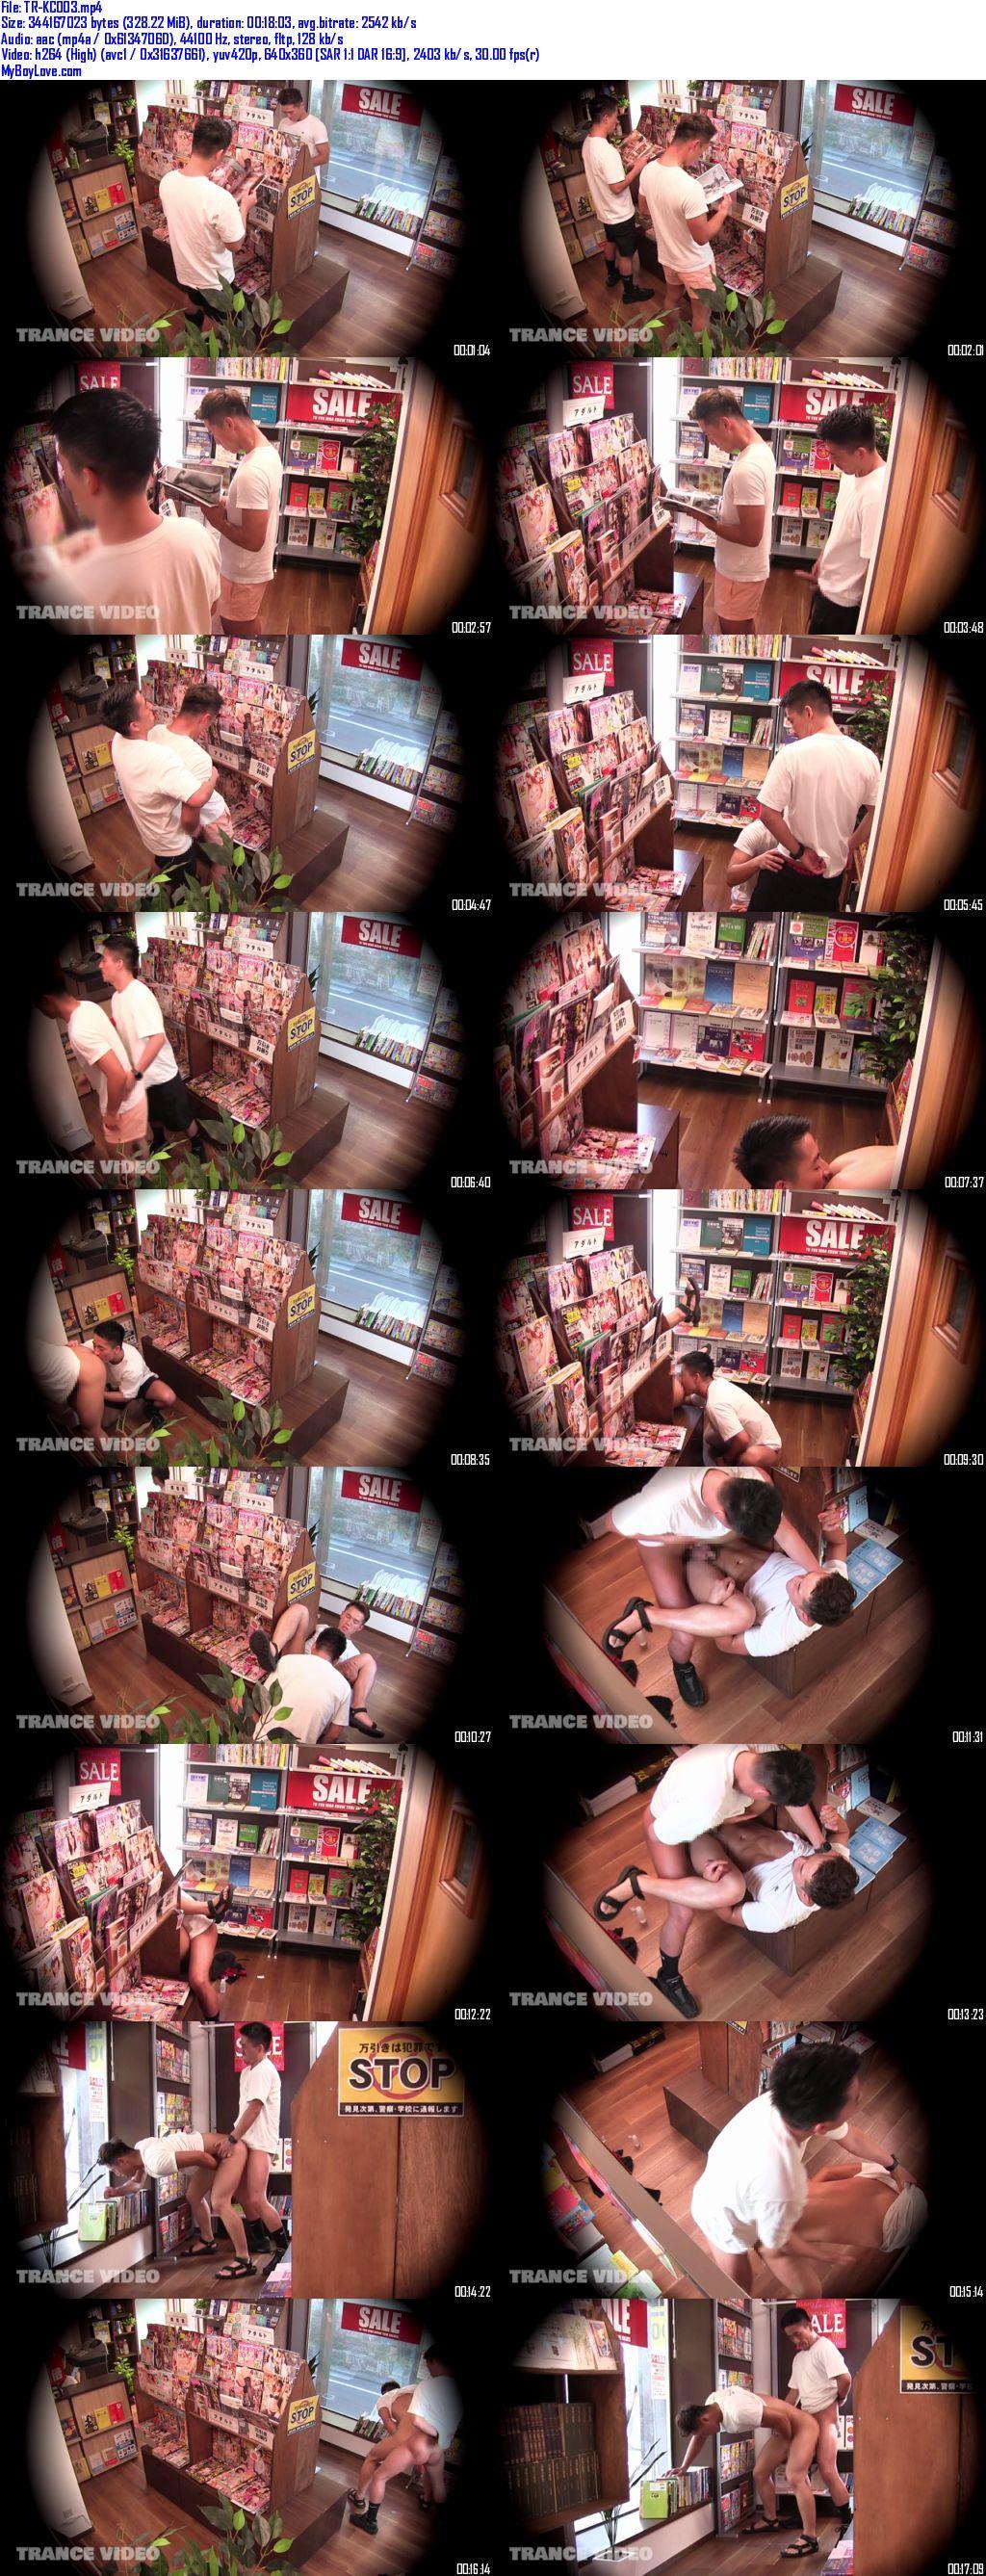 TRANCE VIDEO – TR-KC003 – 実録!!古書店カメラ part3